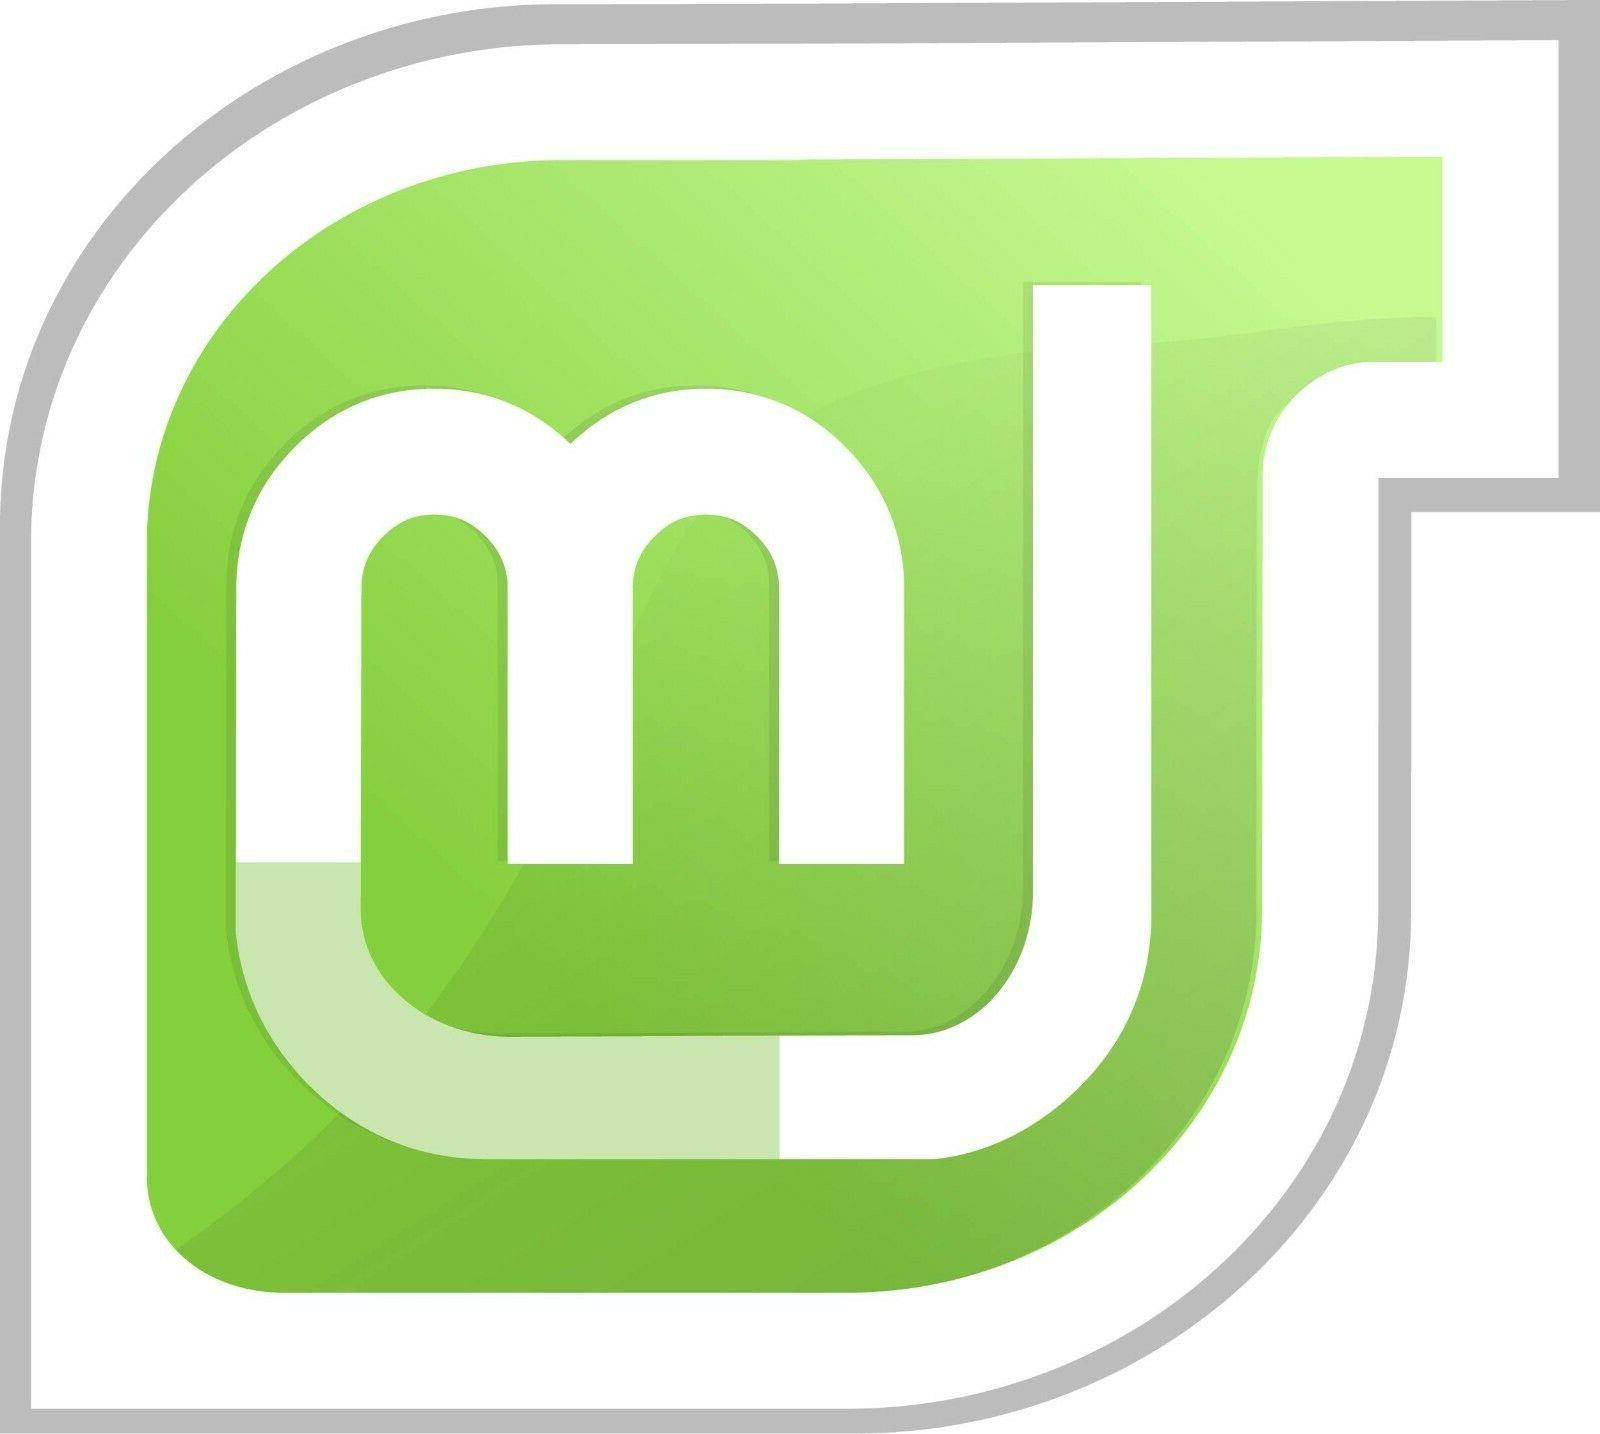 linux mint logo vinyl sticker decal laptop